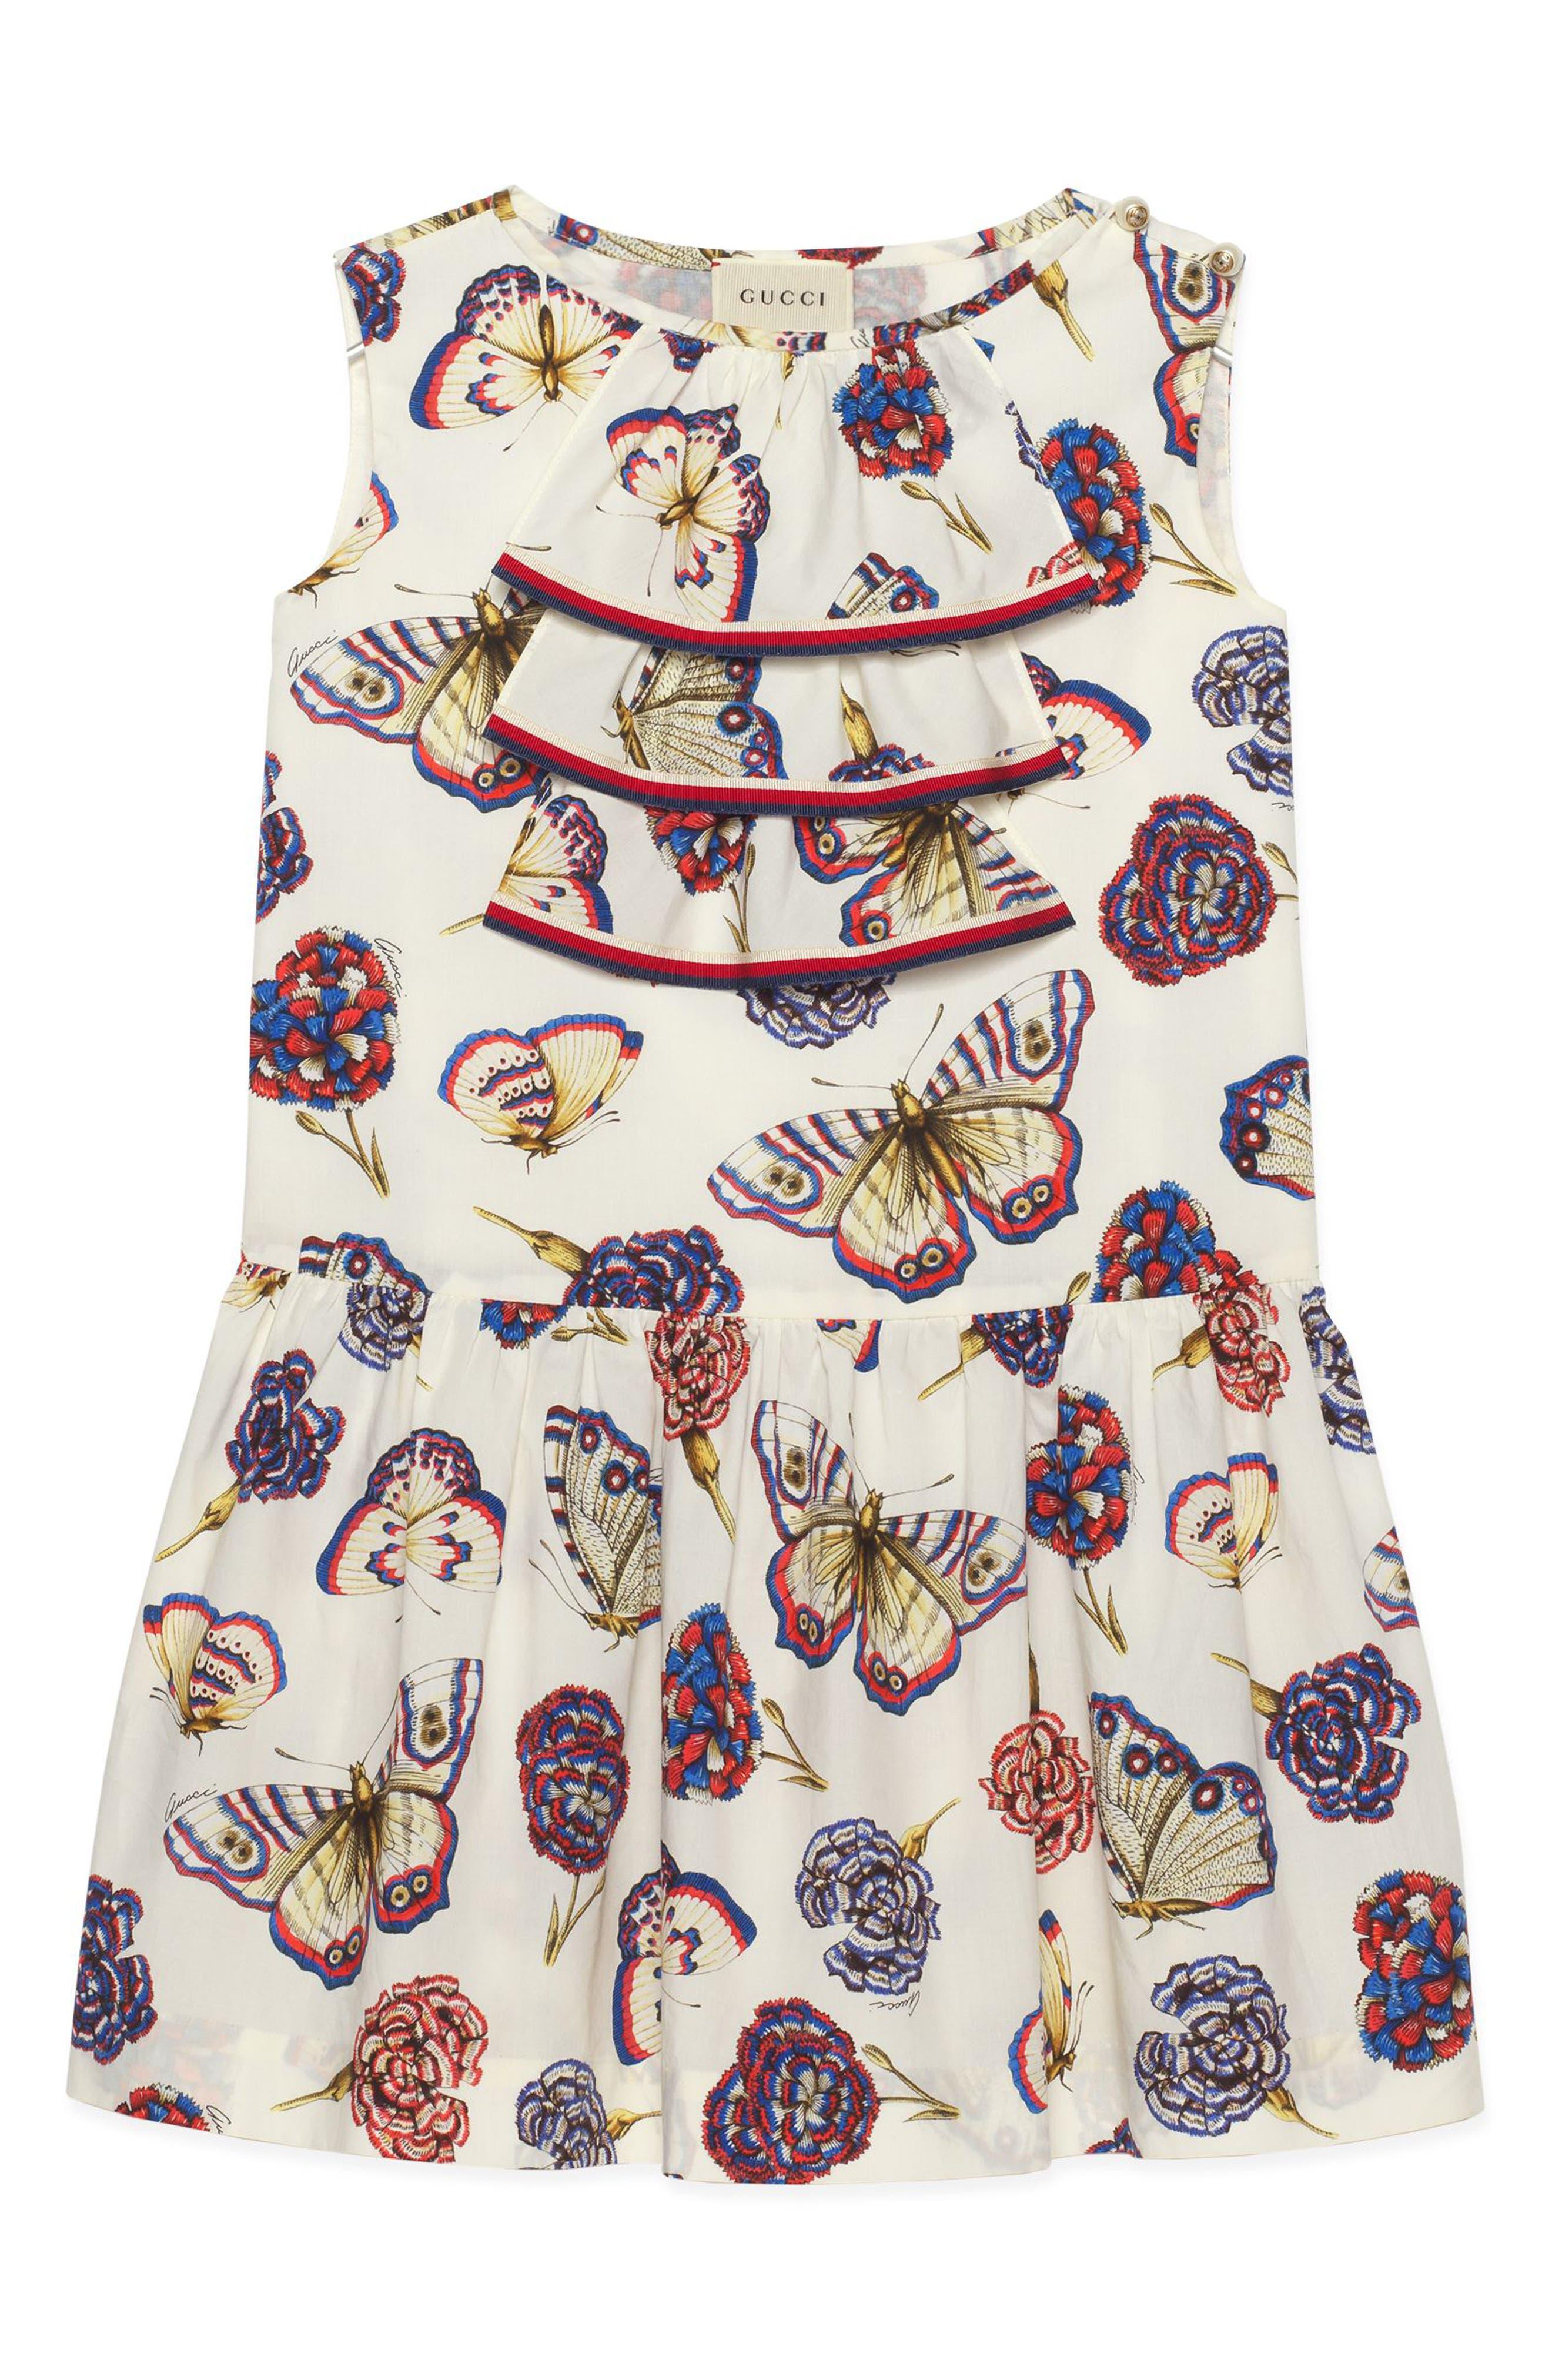 Main Image - Gucci Butterfly Ruffle Dress (Little Girls & Big Girls)